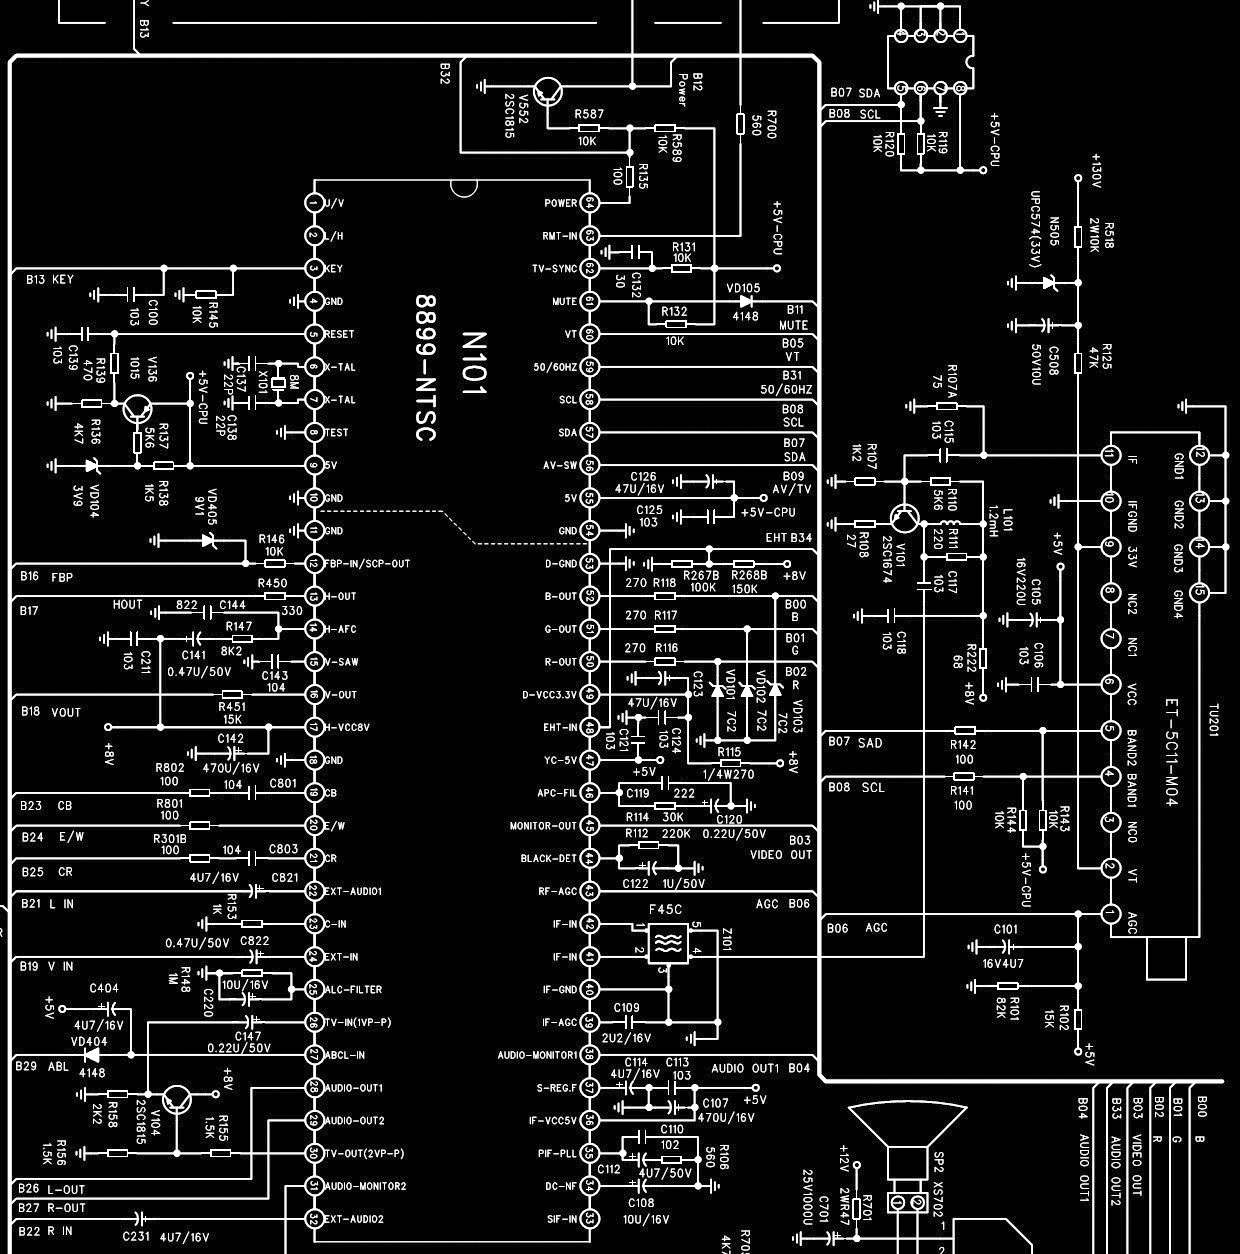 medium resolution of circuit diagram click on the circuit diagram to magnify